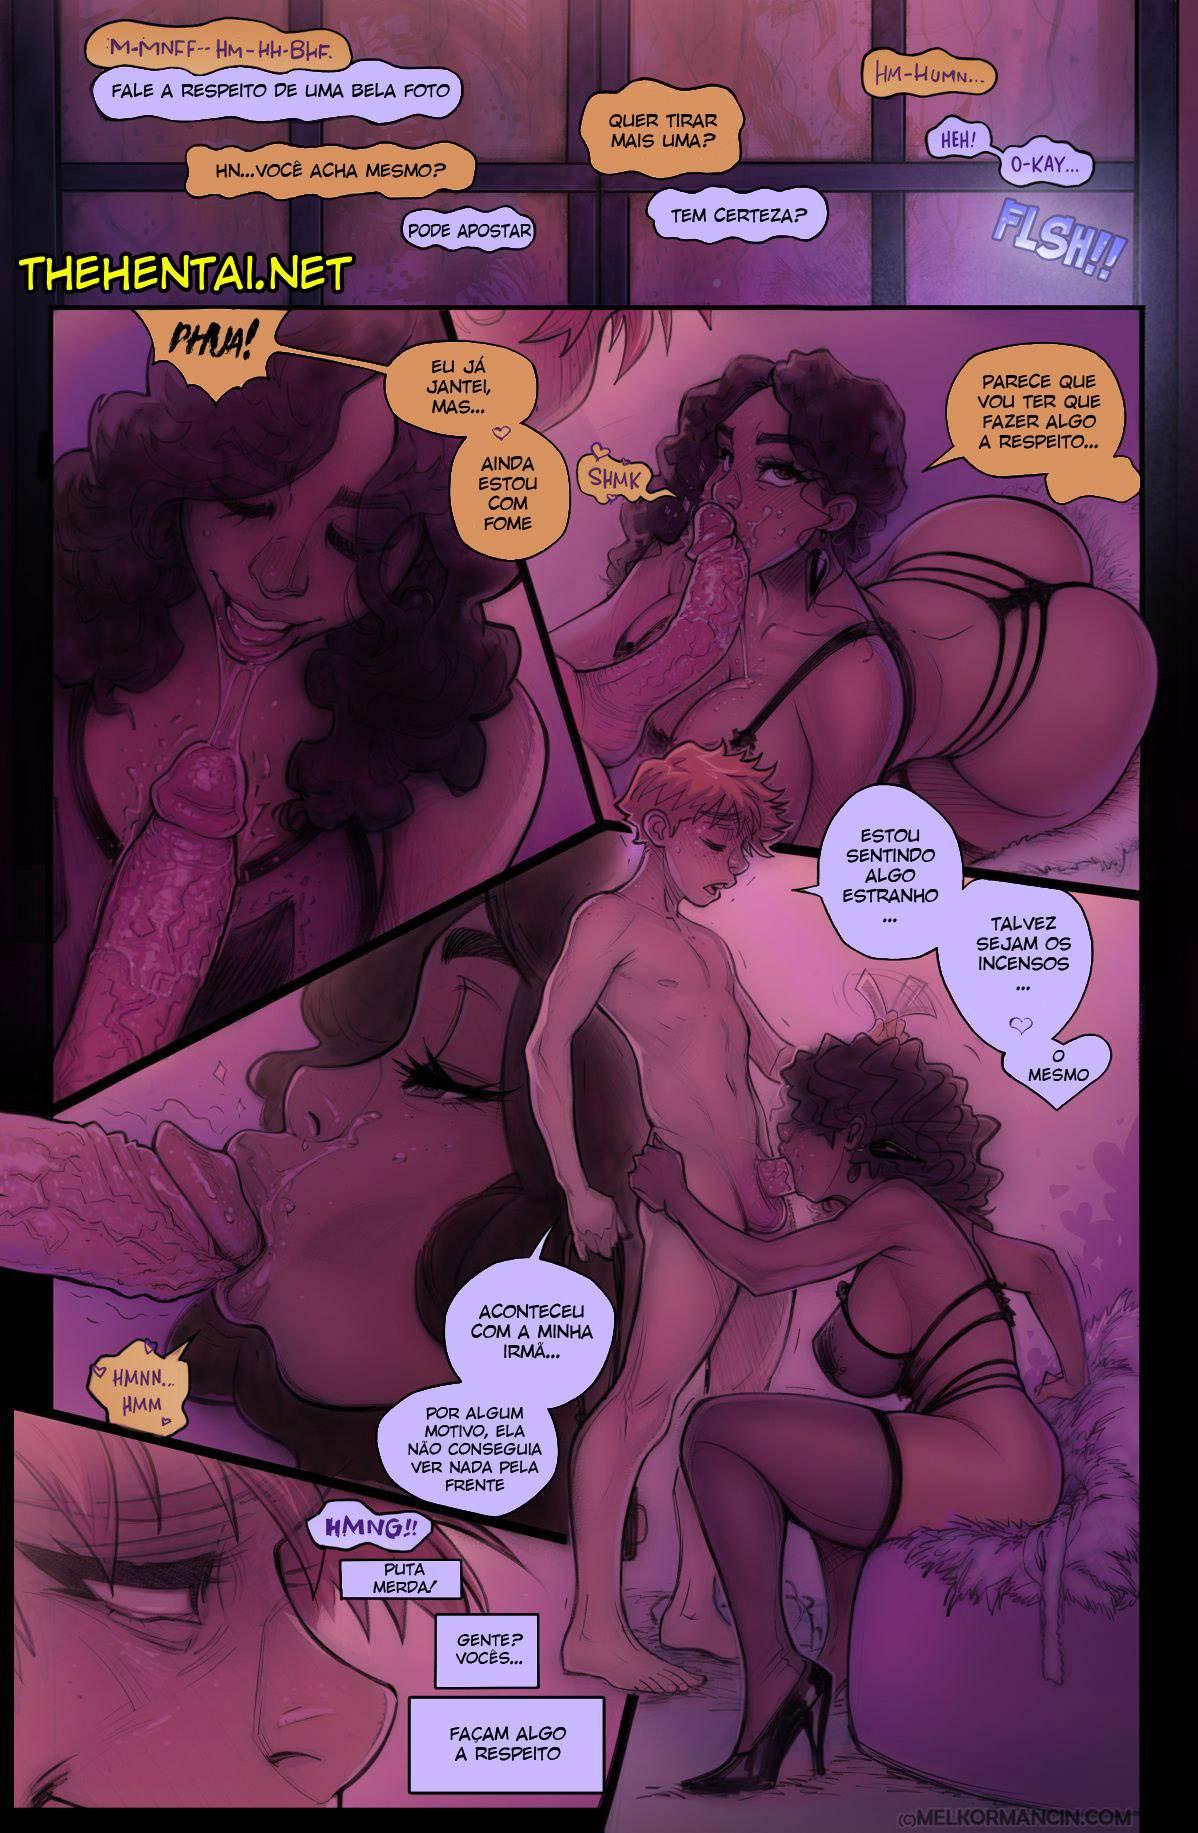 Spades Melkor Mancin Hentai pt br 15 - hentai, exclusiva, comics-hq